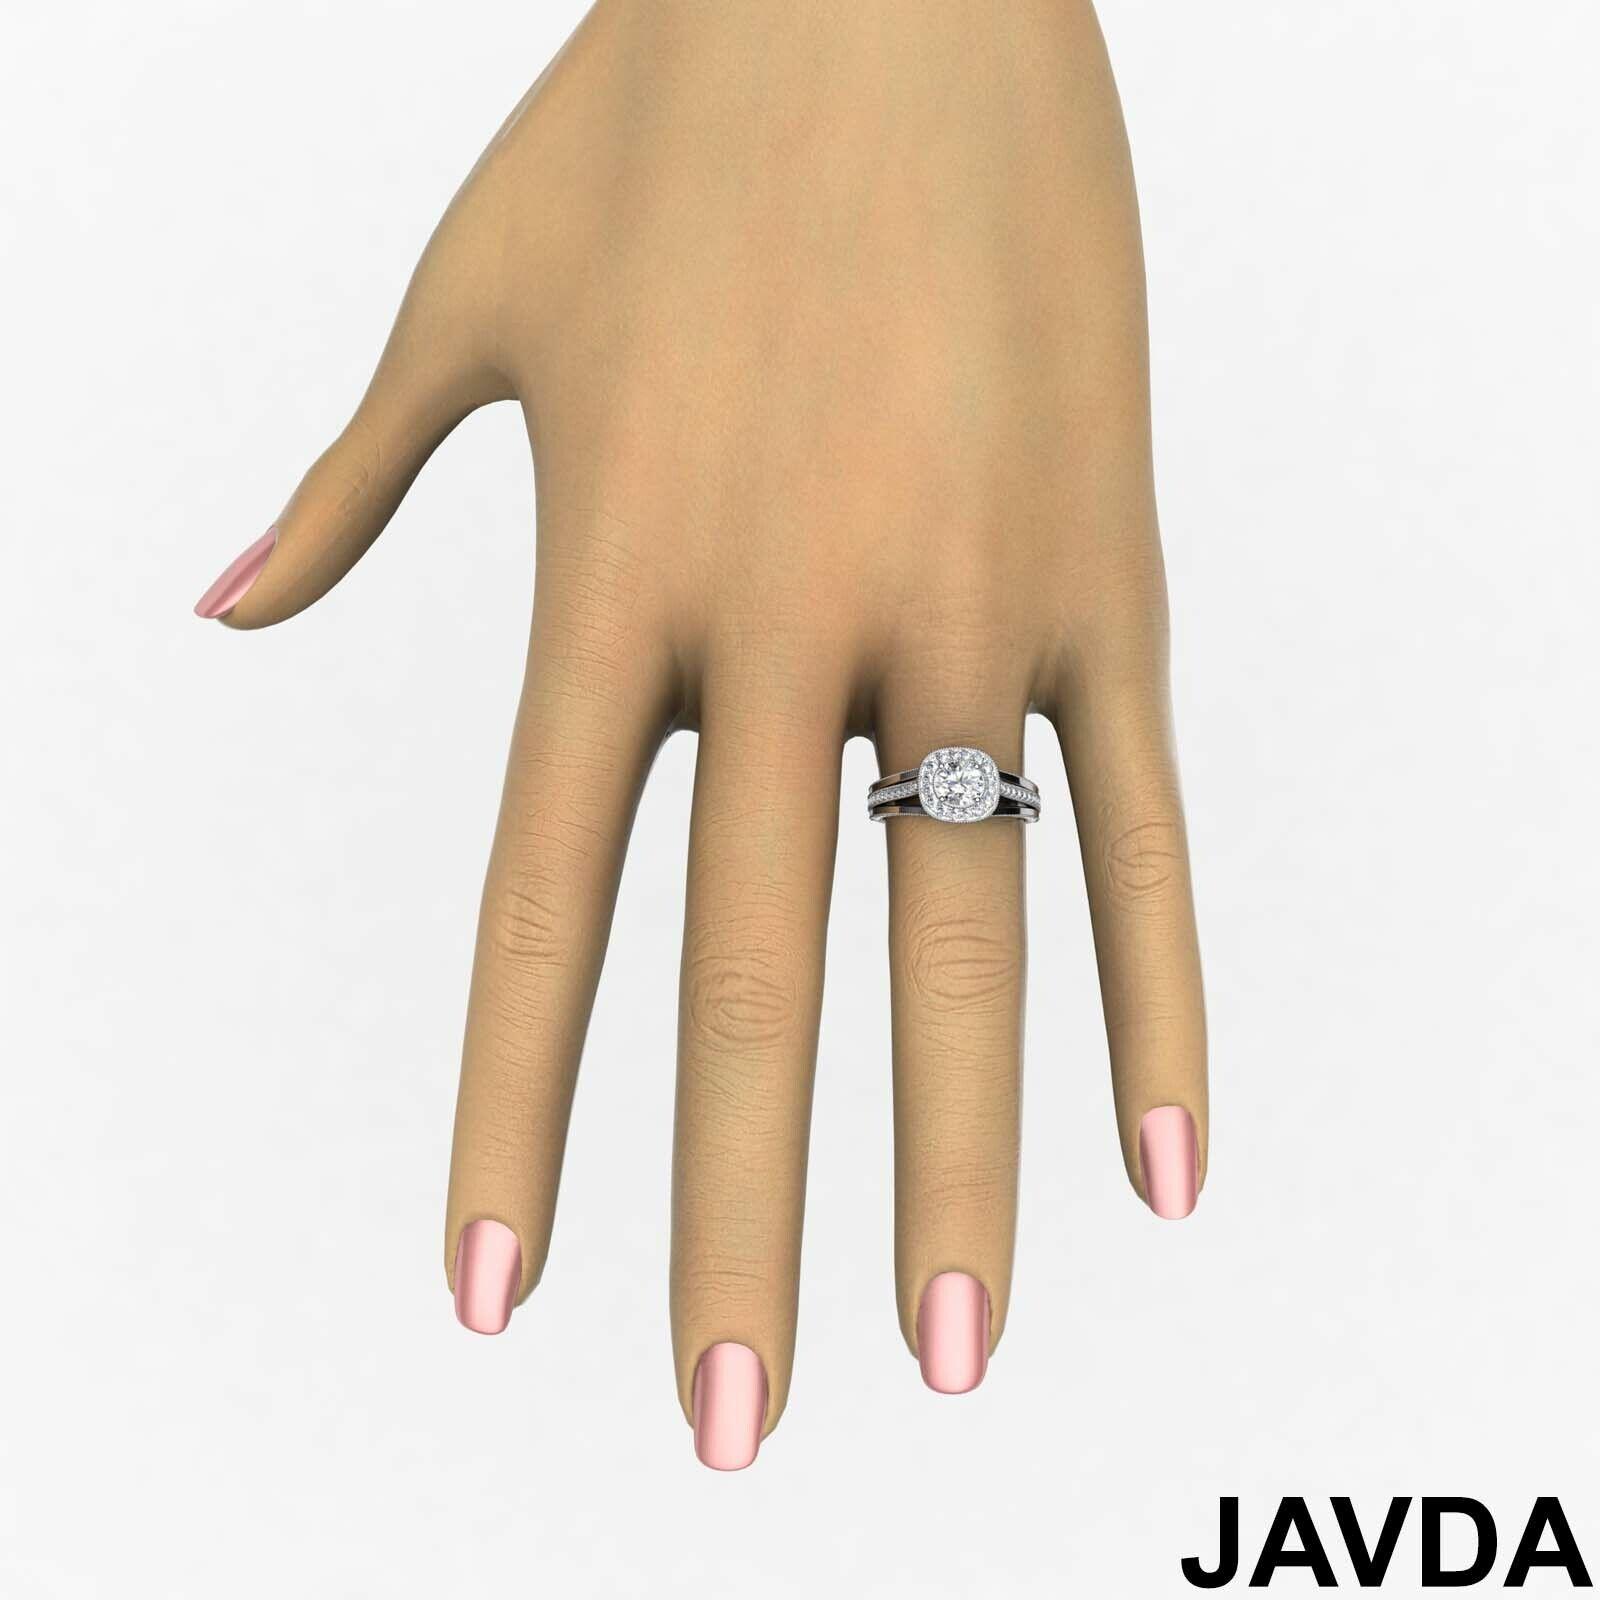 1.6ctw Bridge Accent Round Diamond Engagement Ring GIA E-VVS2 White Gold Rings 2